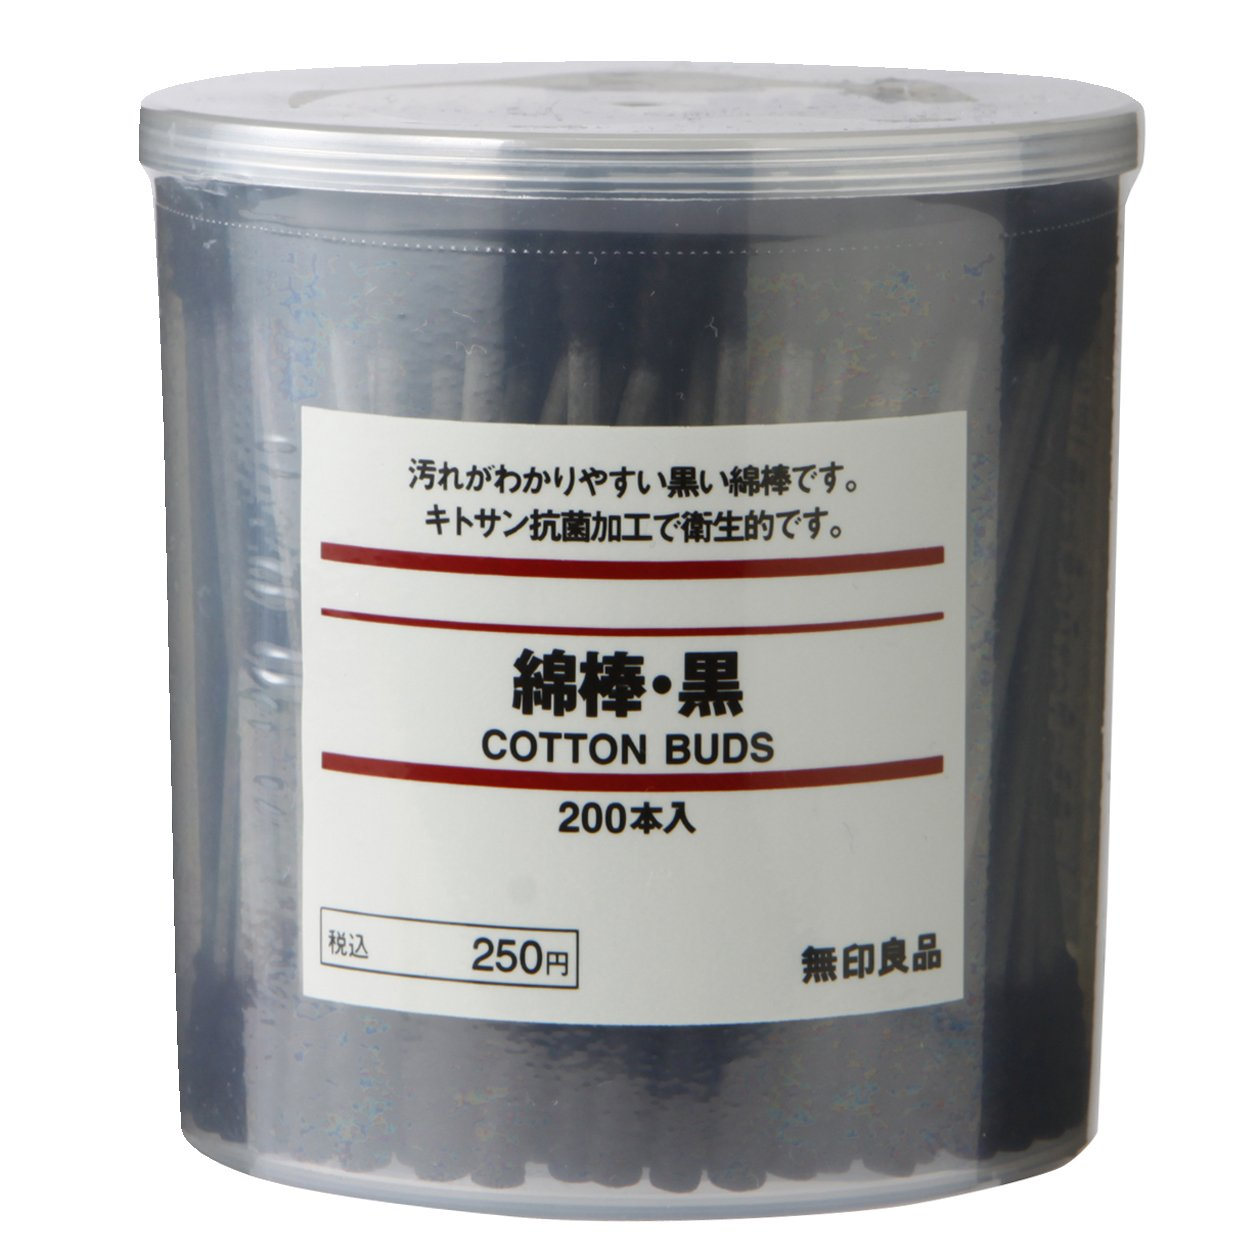 MoMa Muji Cotton Buds 200pcs inside Black Color by Moma Muji by Muji